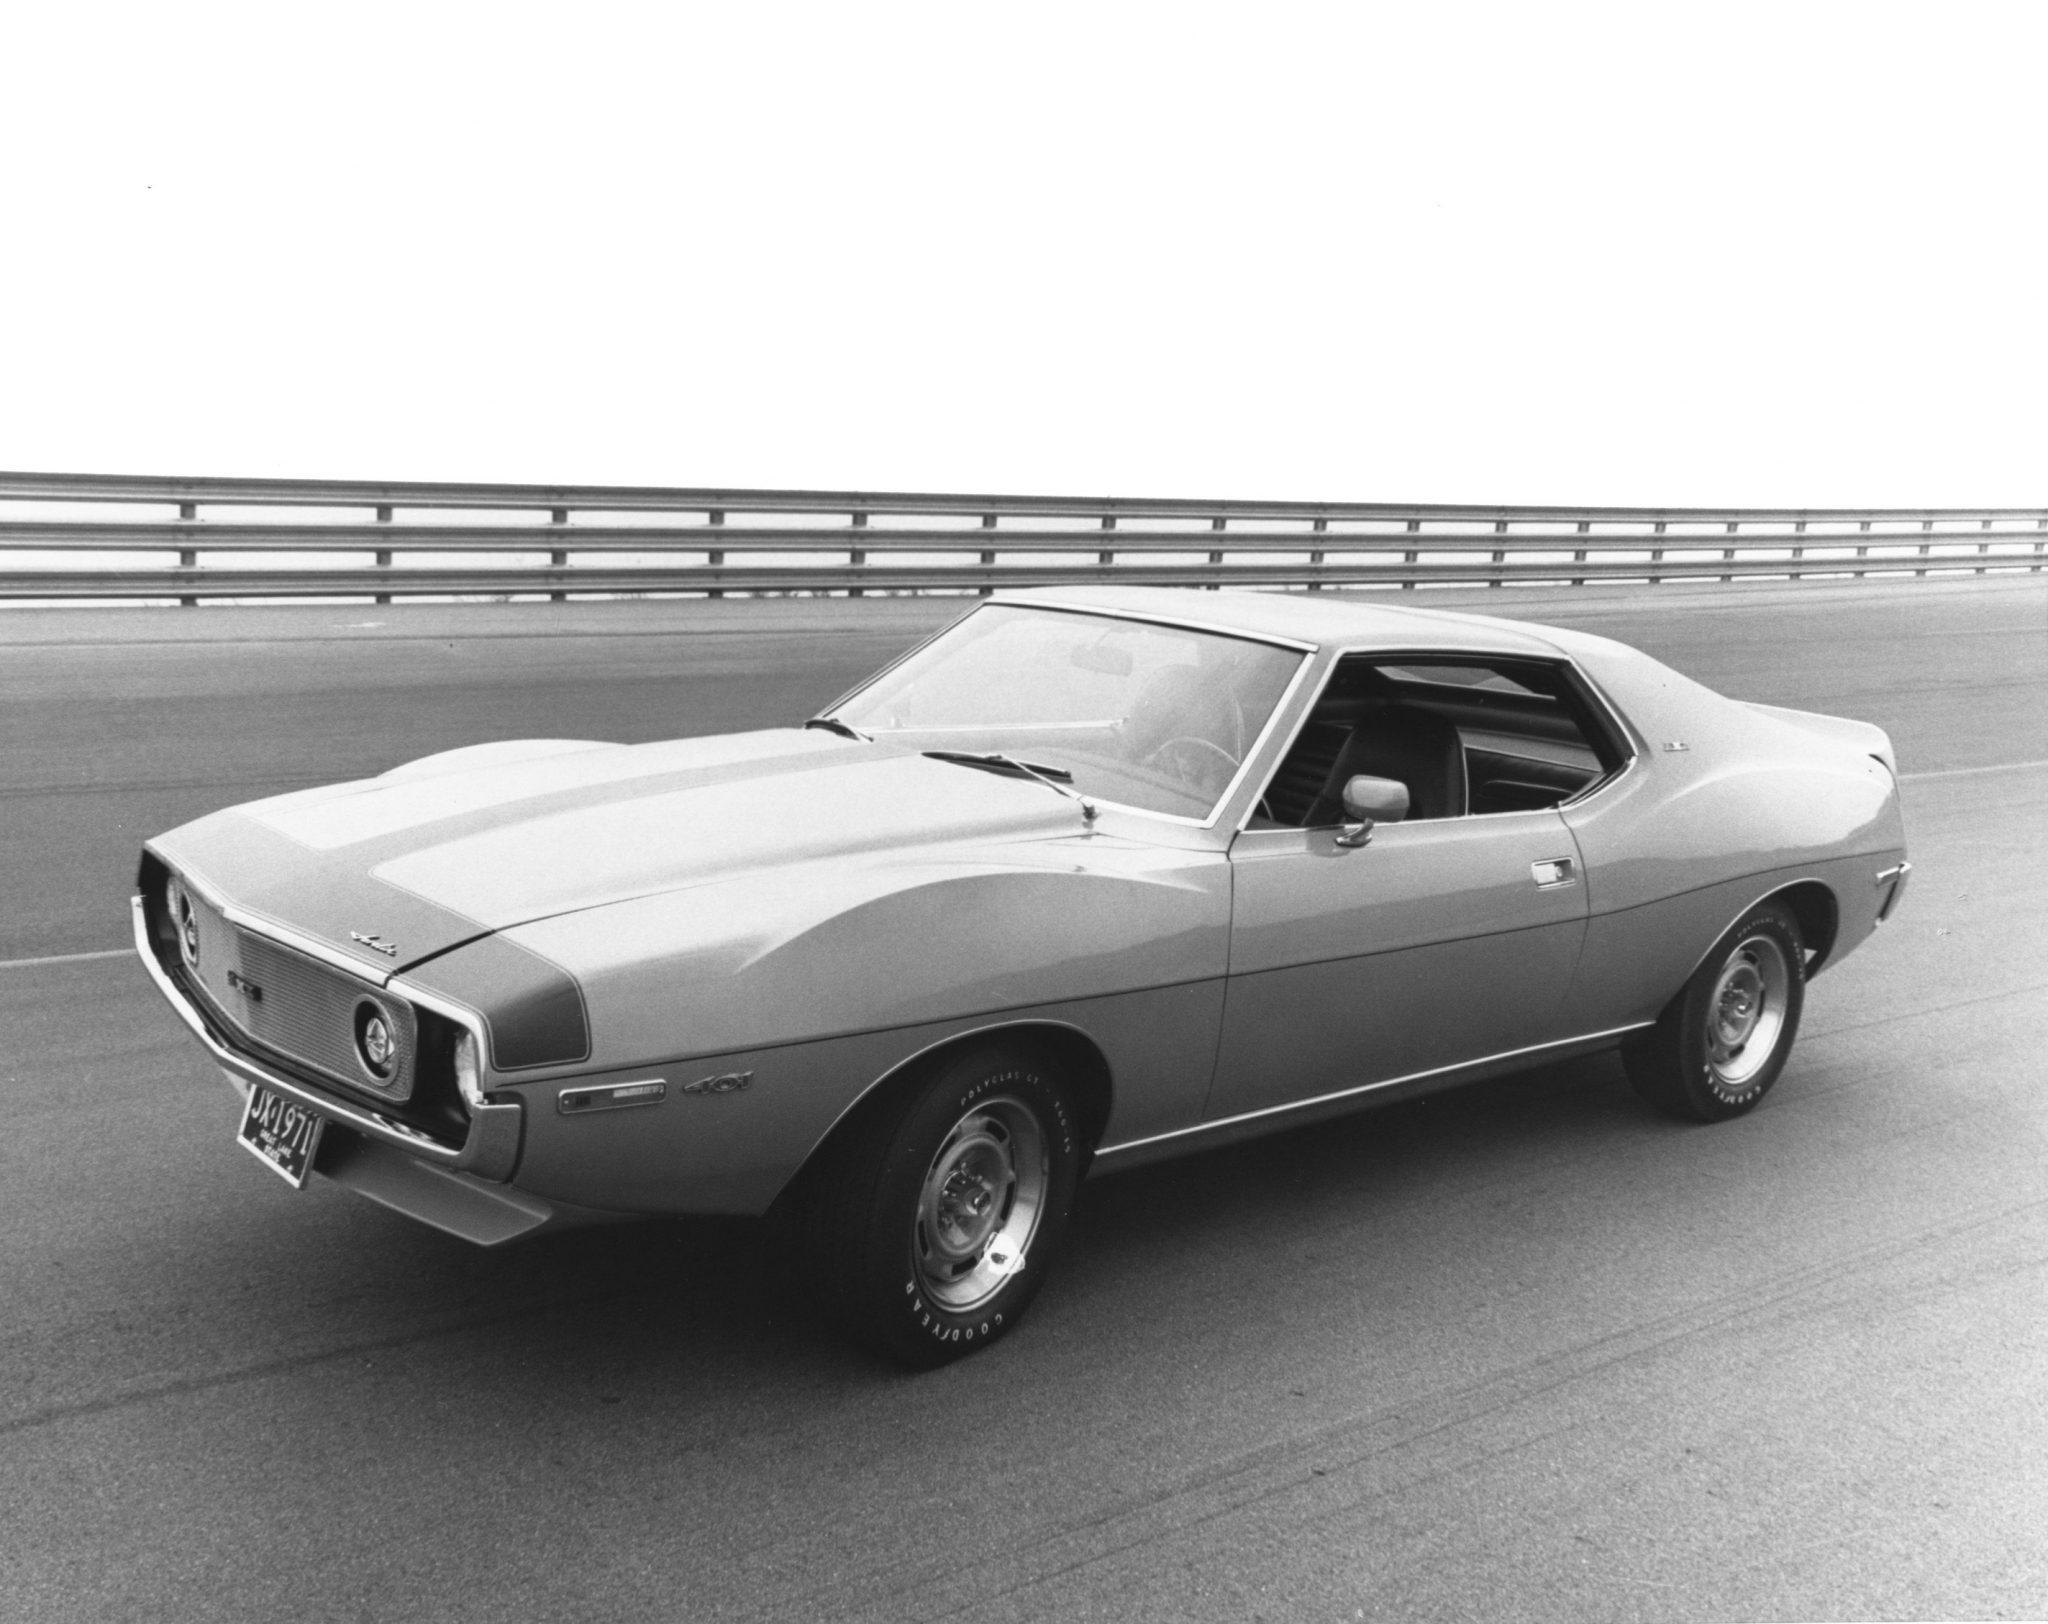 1971 American Motors Javelin